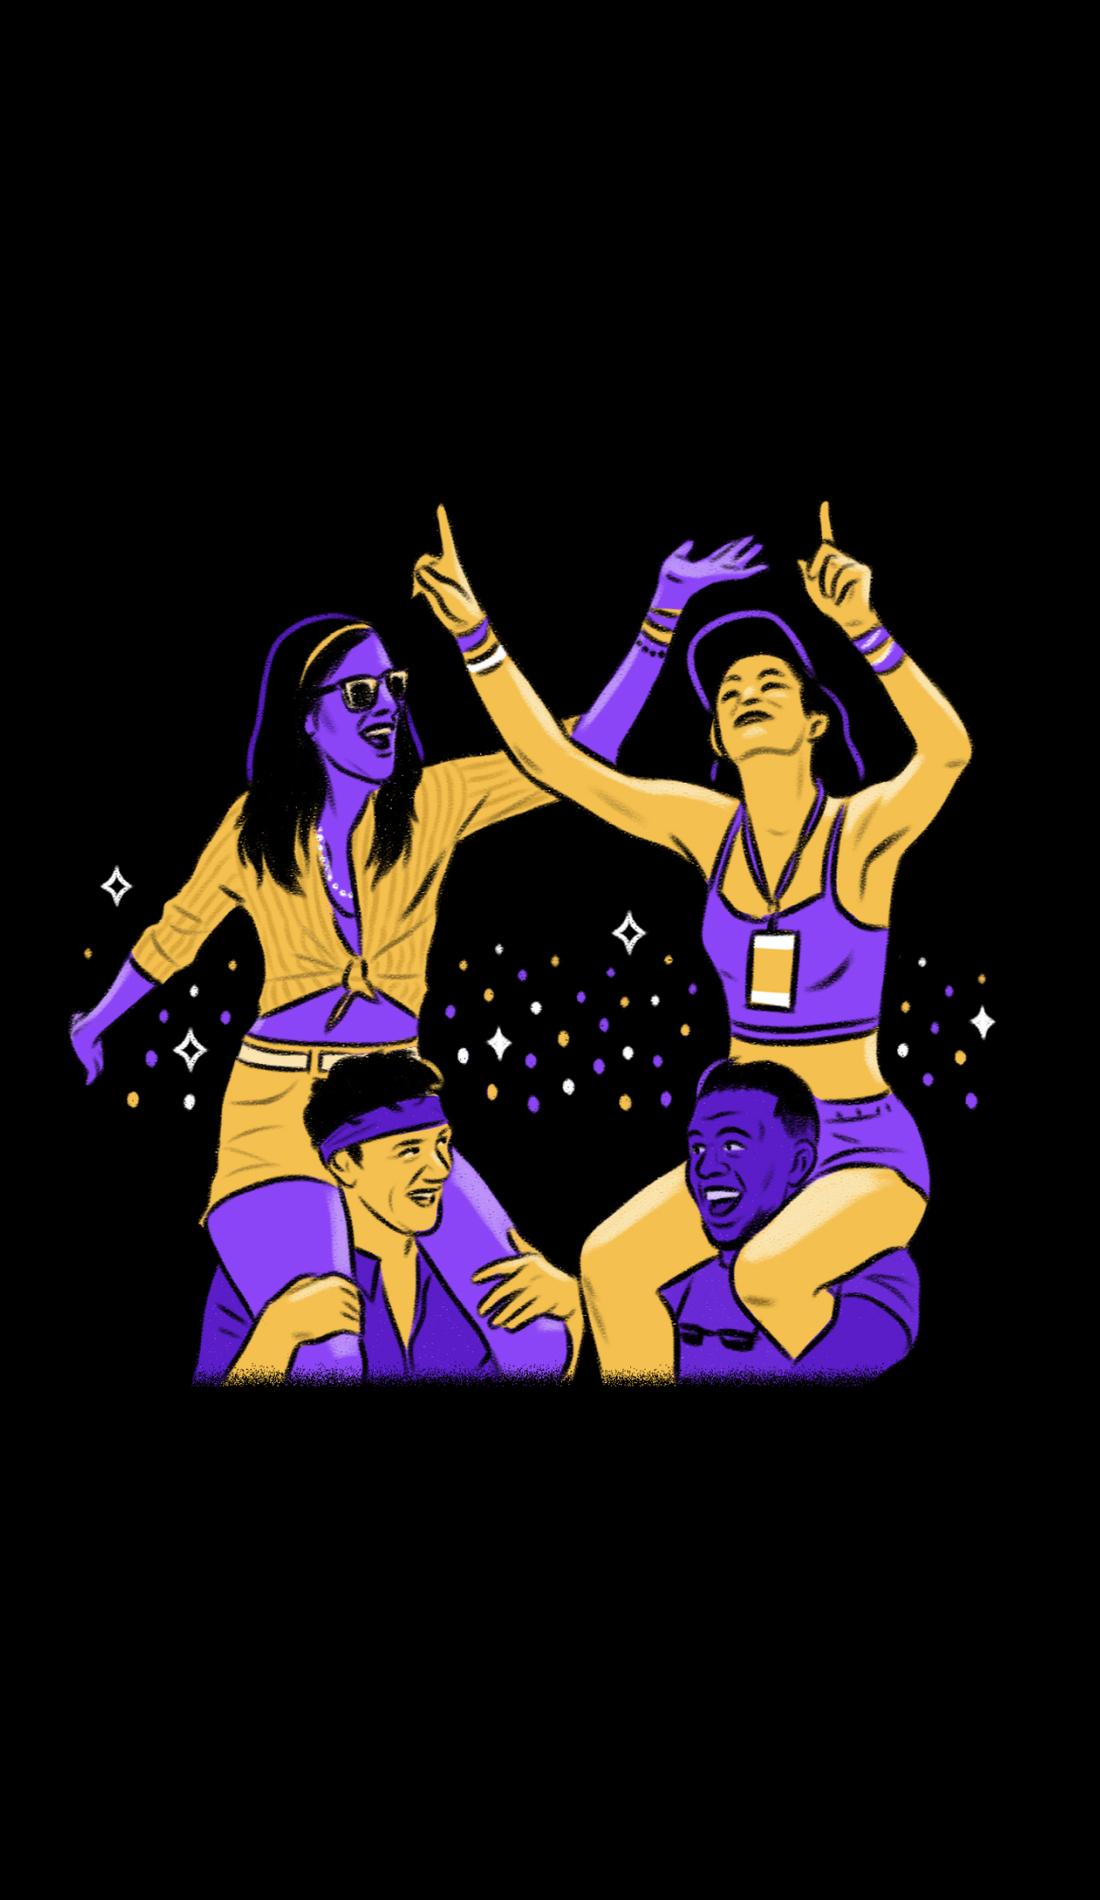 A Burning Man live event